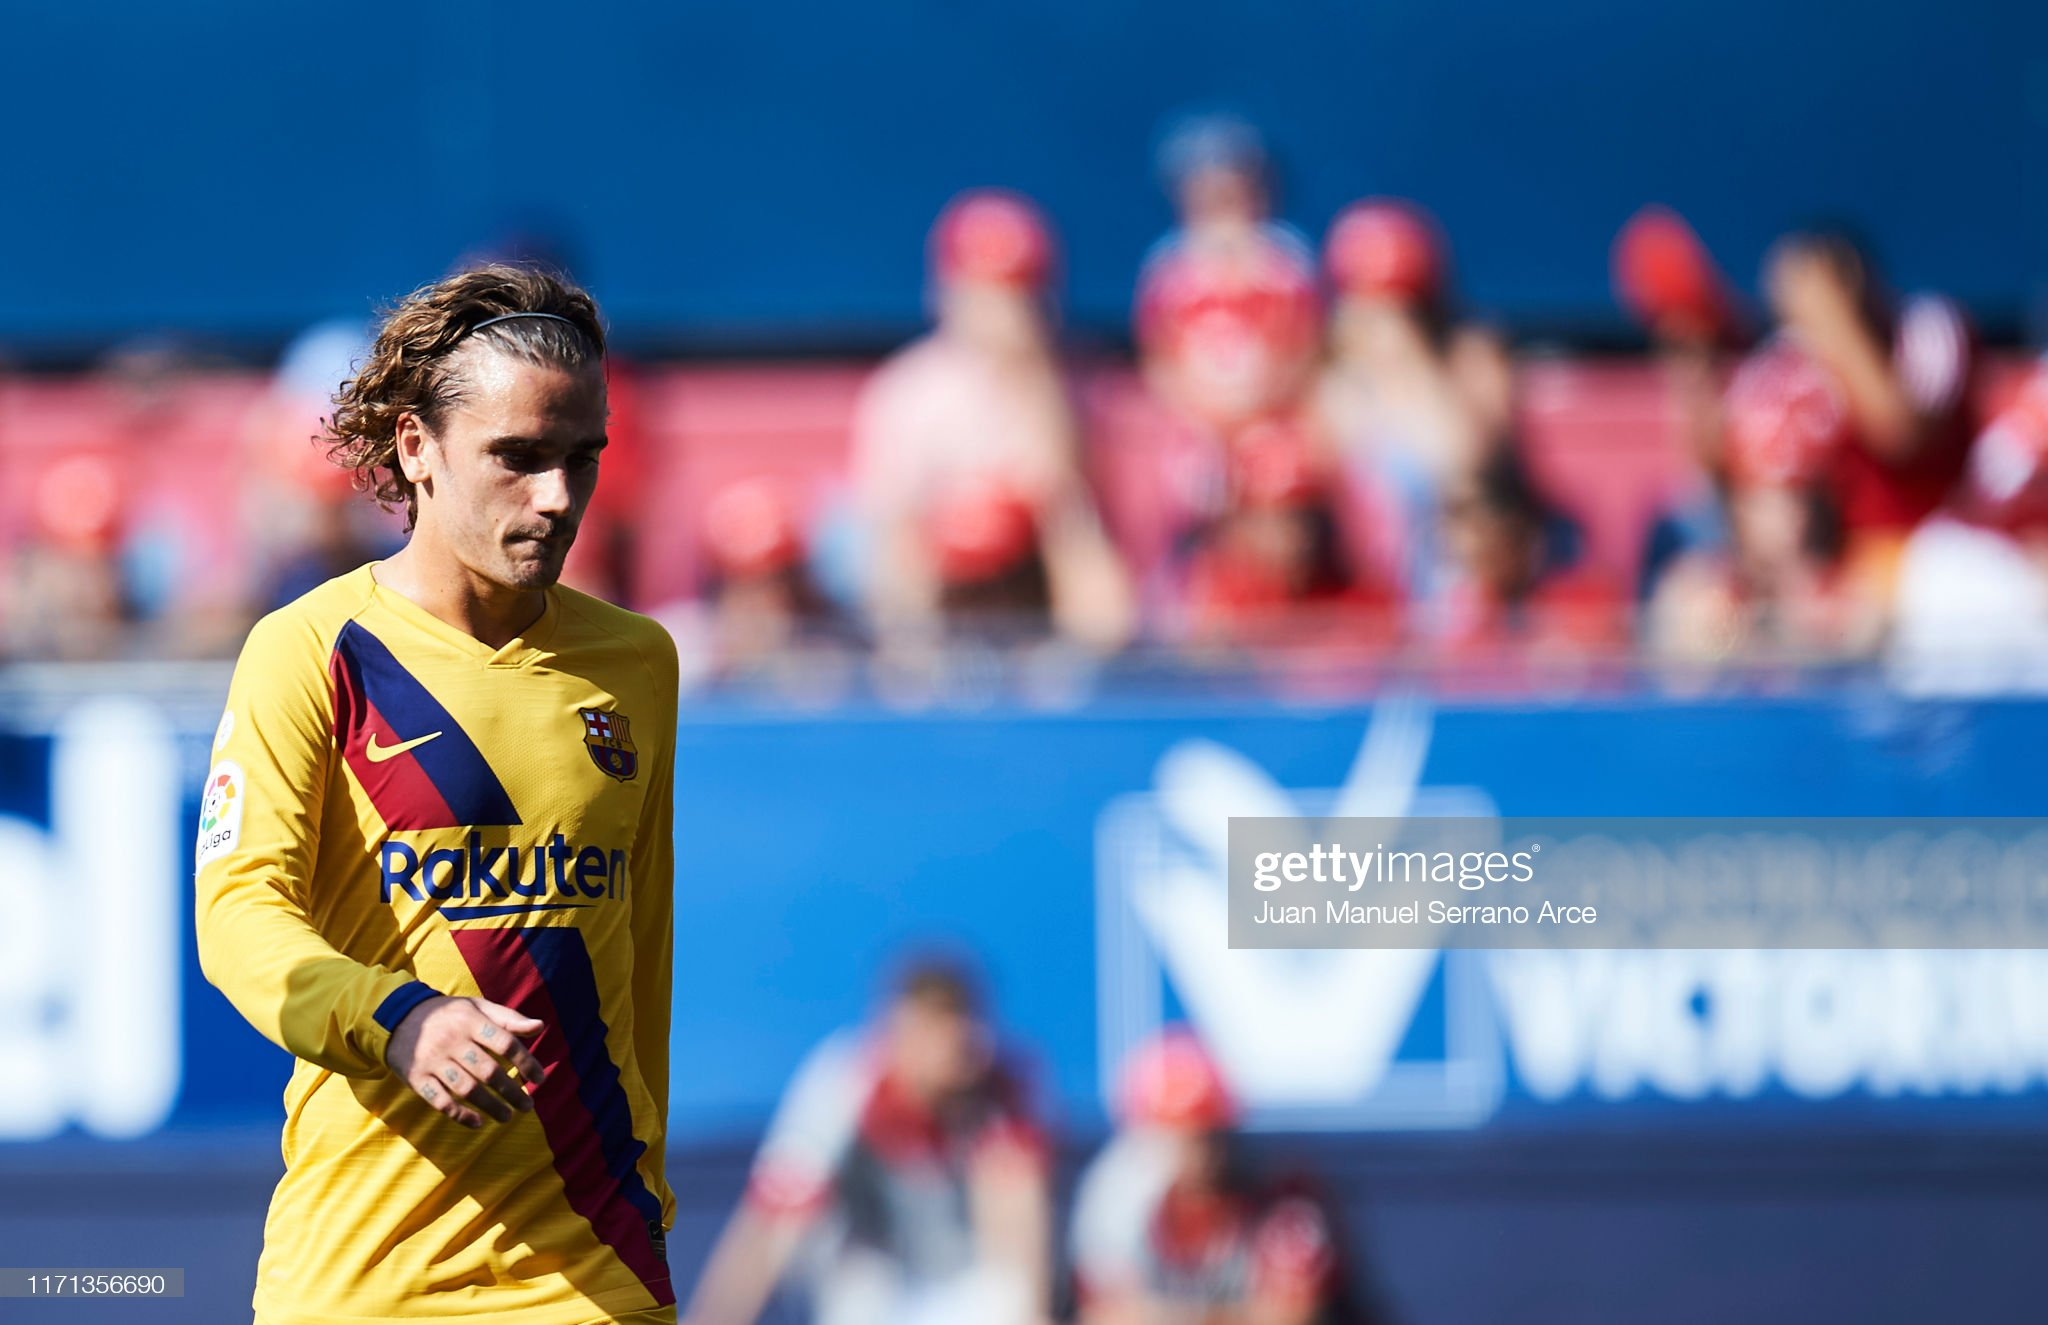 صور مباراة : أوساسونا - برشلونة 2-2 ( 31-08-2019 )  Antoine-griezmann-of-fc-barcelona-reacts-during-the-liga-match-ca-picture-id1171356690?s=2048x2048